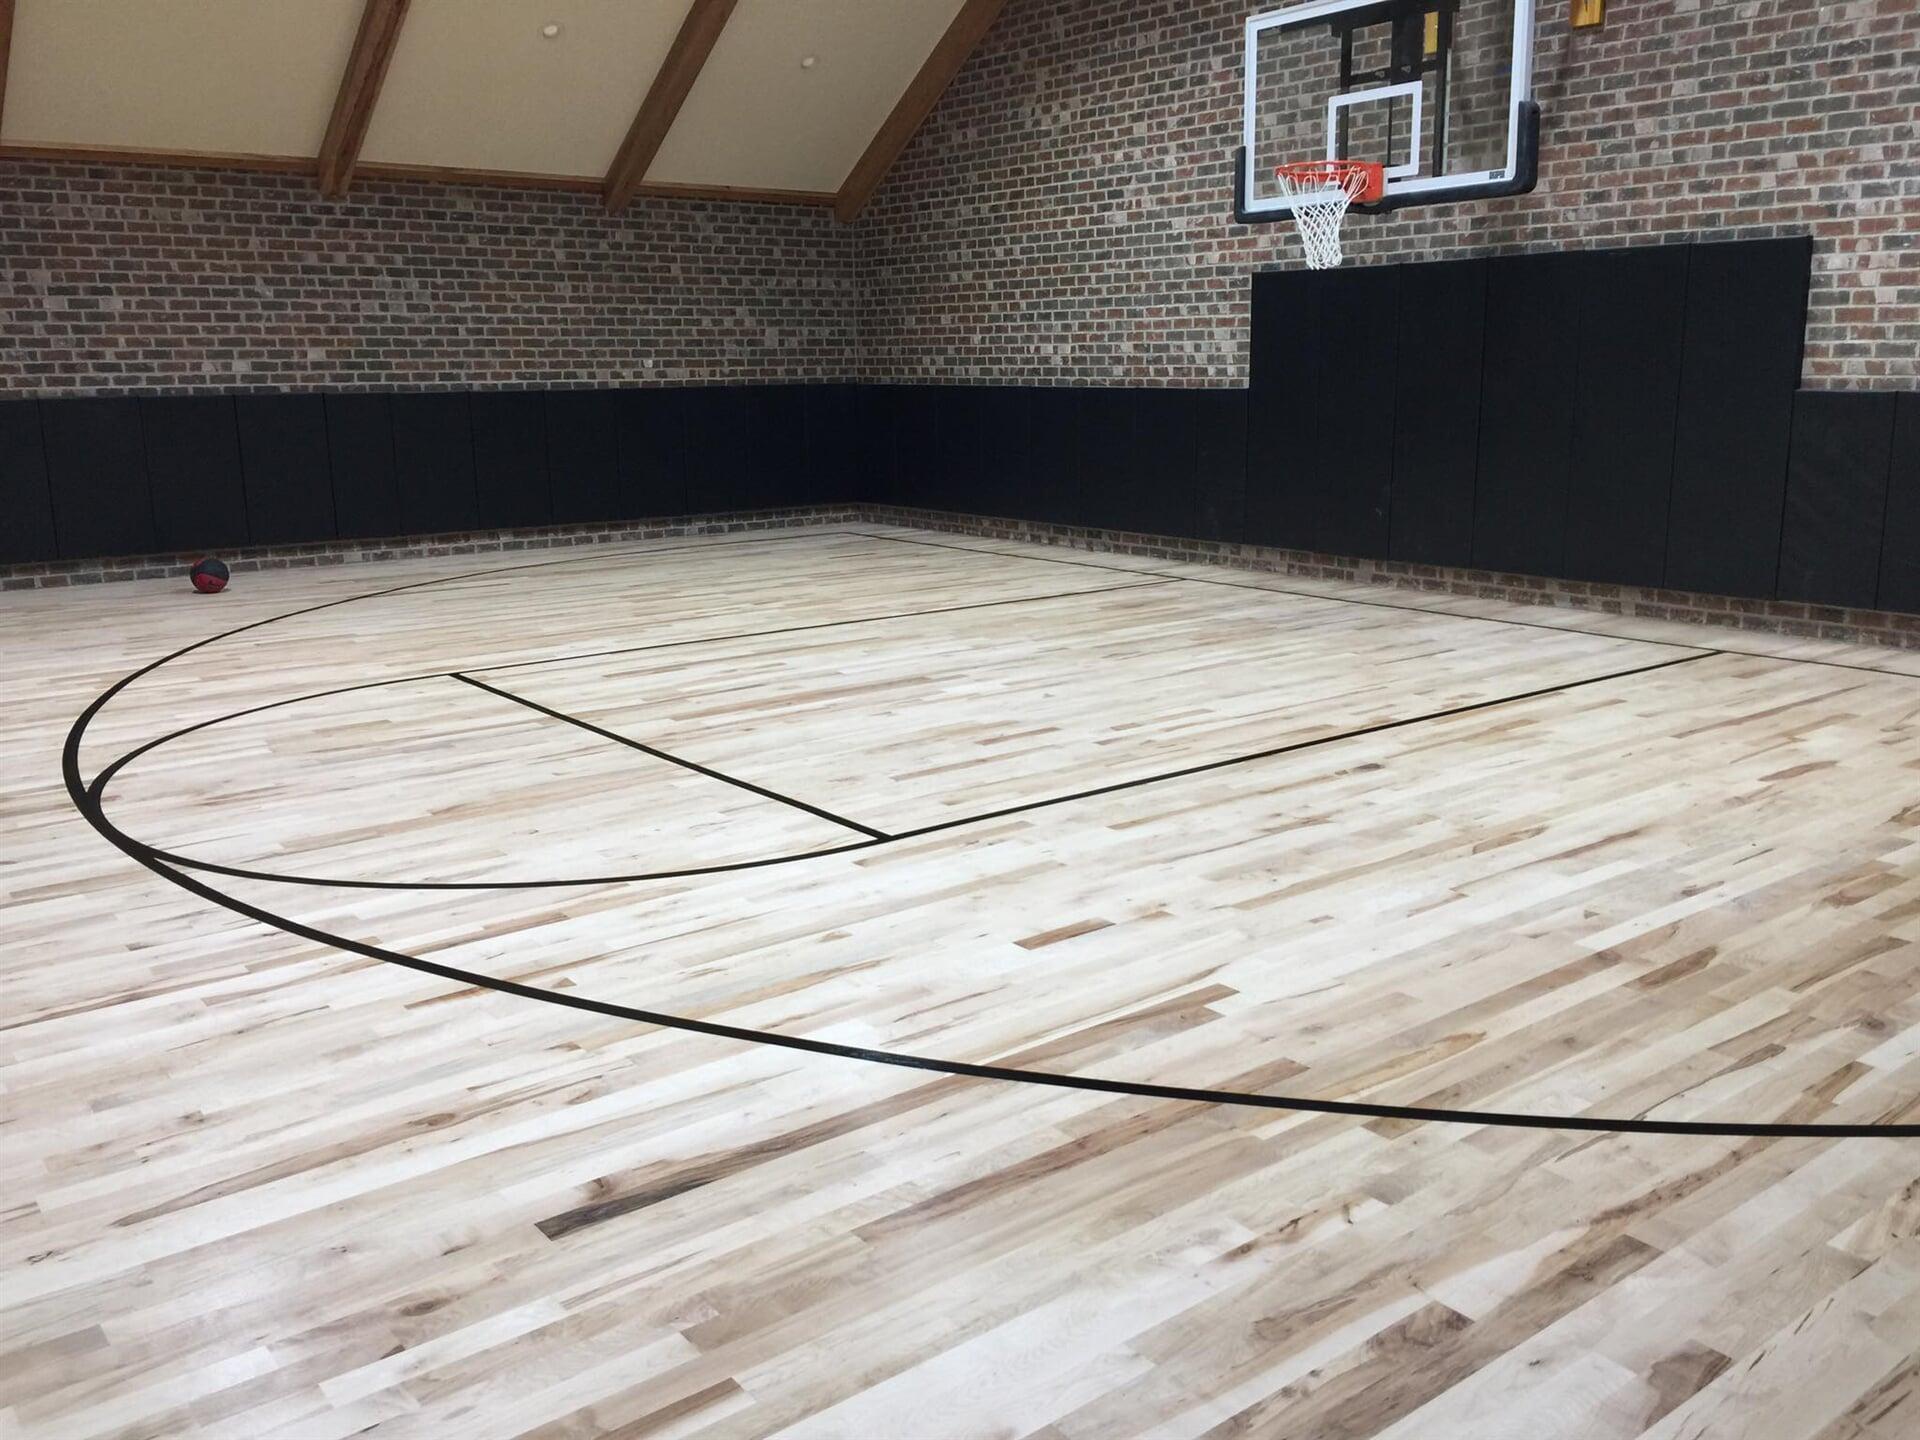 Gynasium flooring in Texarkana, TX from Carter Adams Flooring